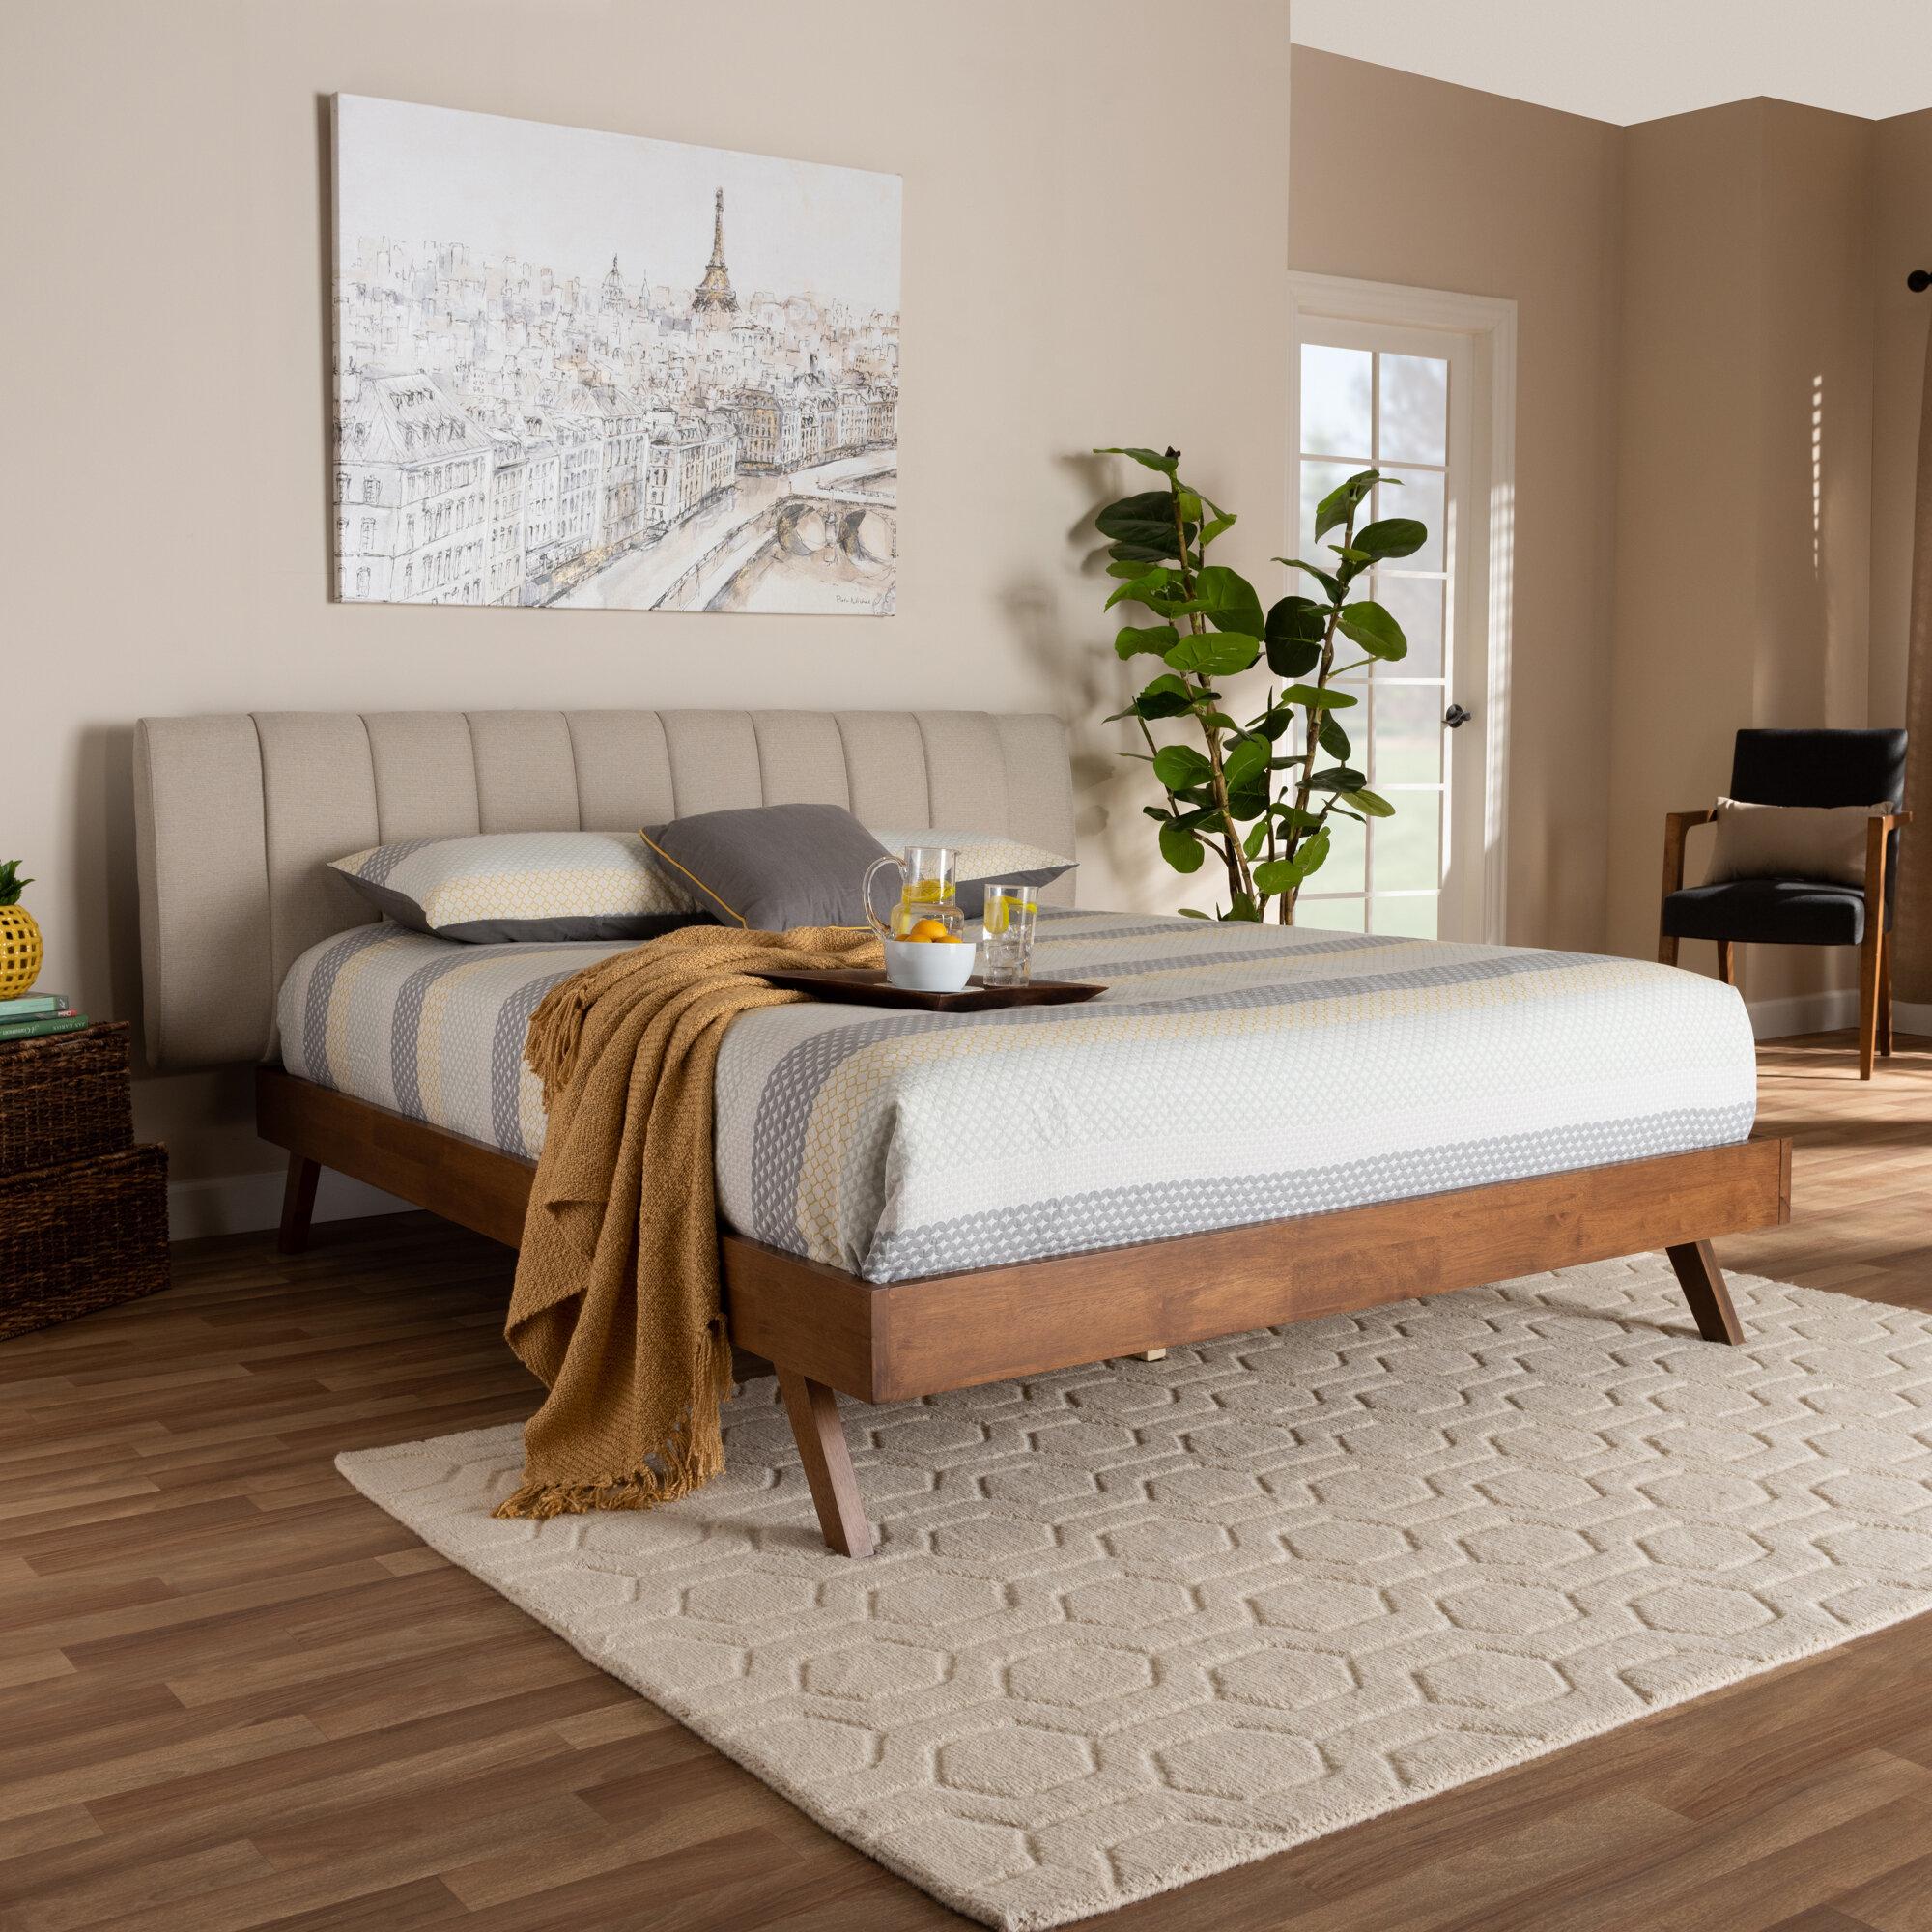 Corrigan Studio Britten Mid Century Modern Upholstered Platform